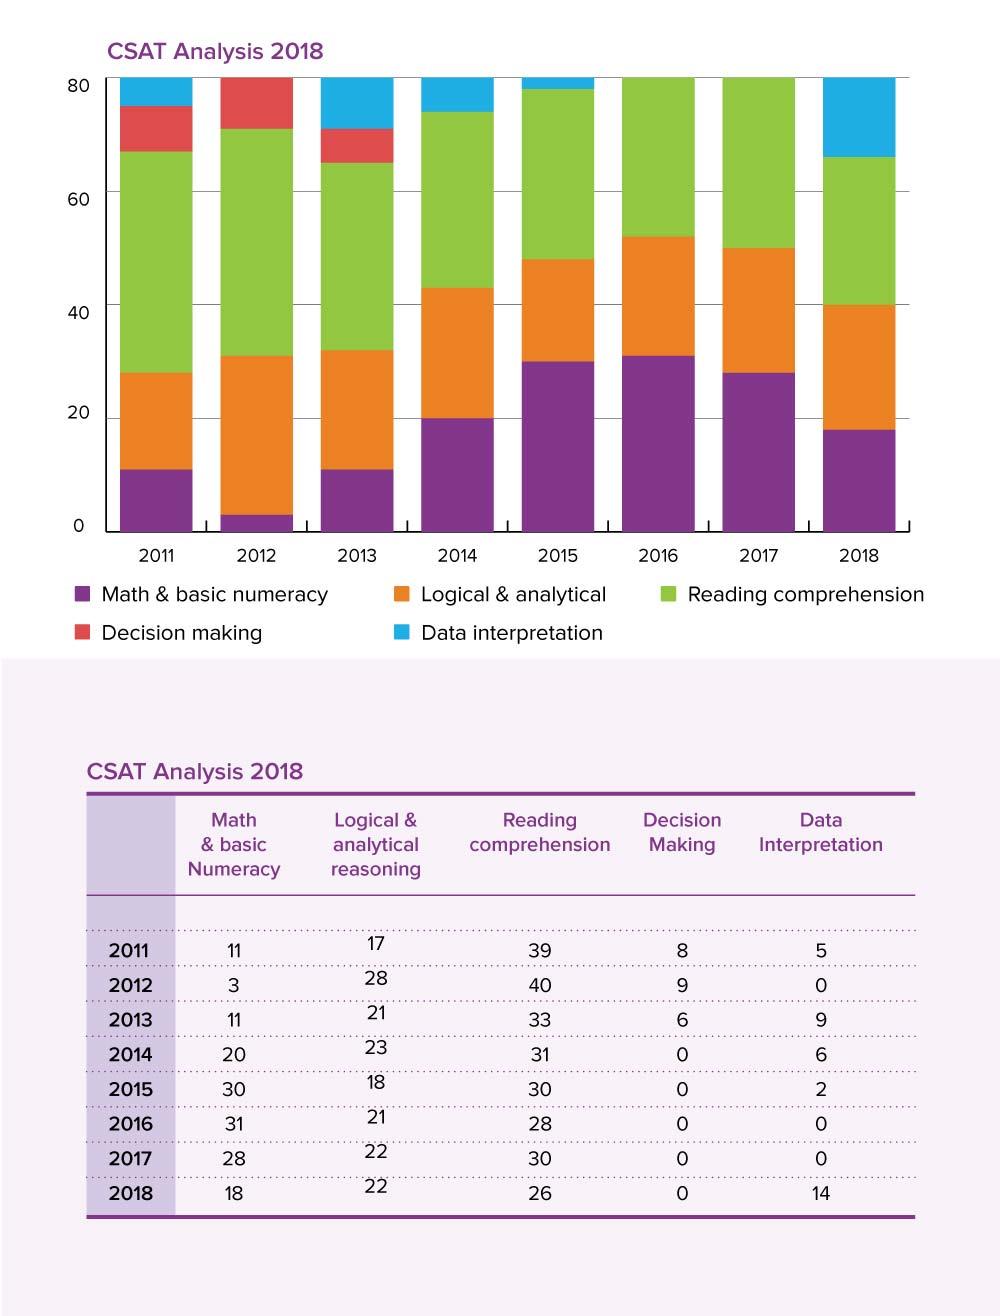 UPSC 2019: CSAT trend analysis 2011-2017